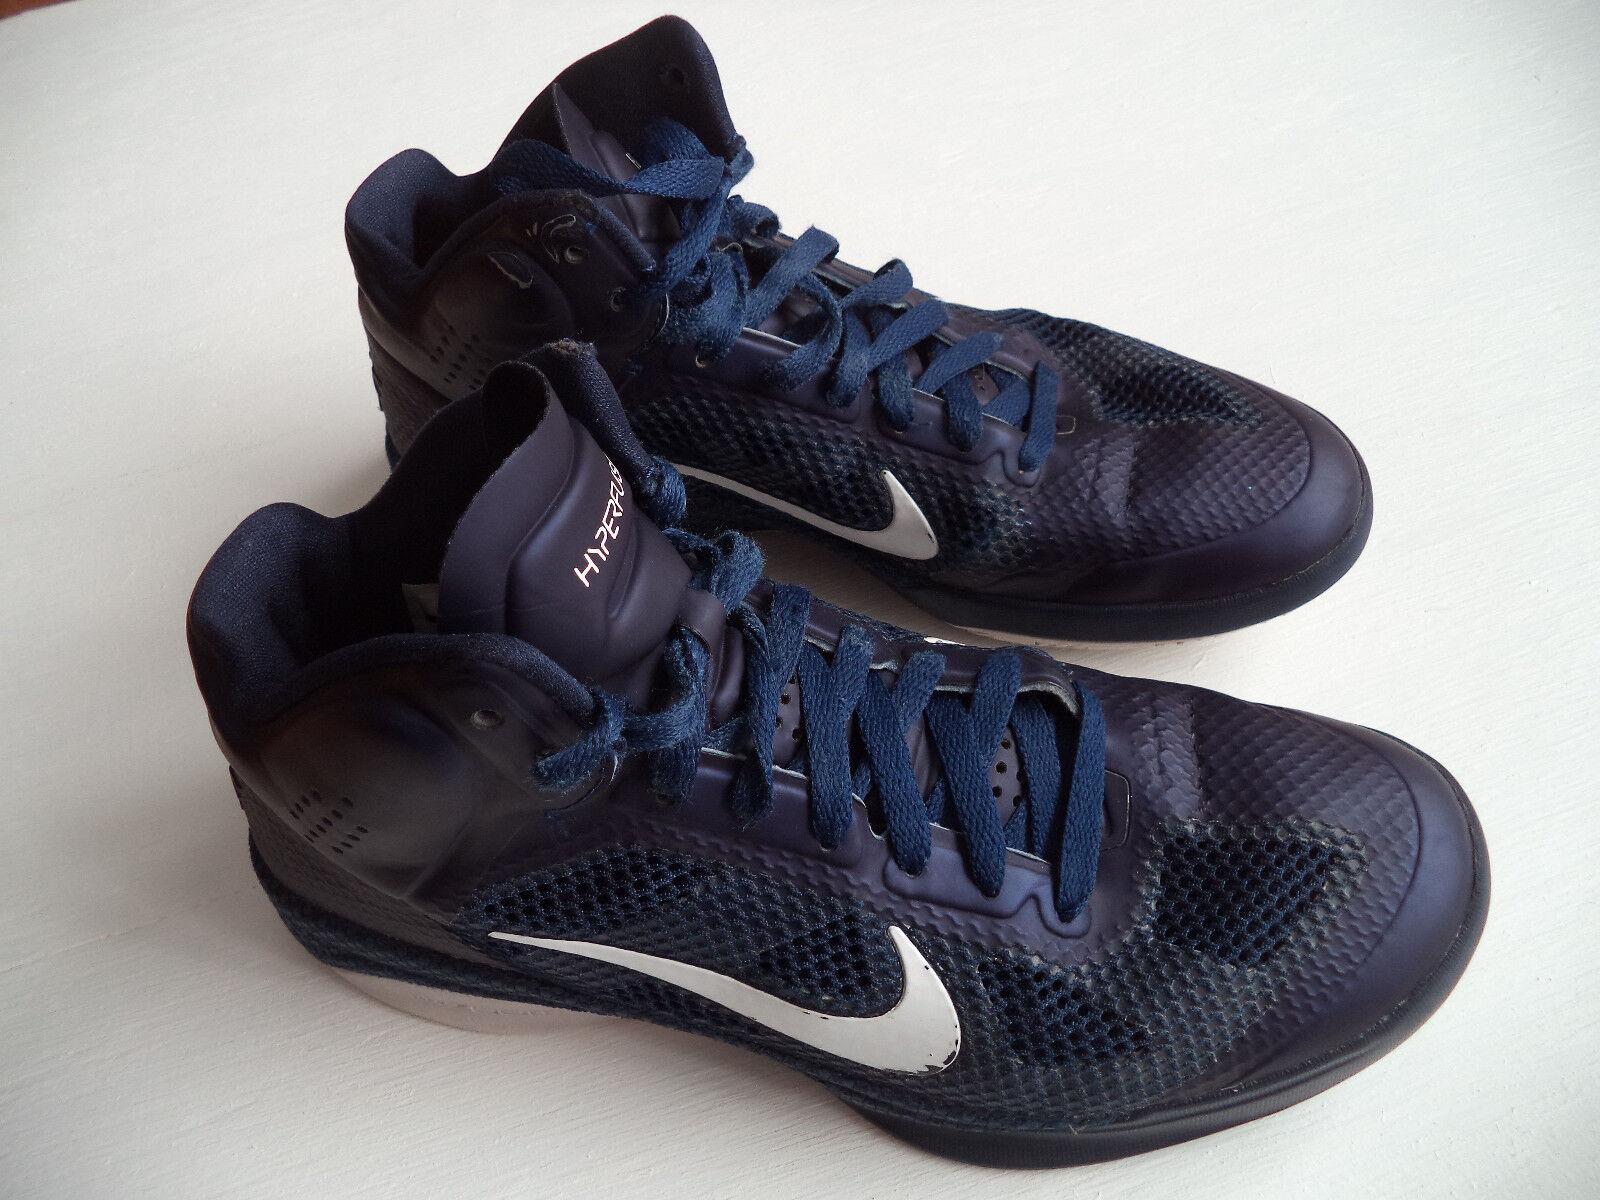 Mens Nike Hyperfuse baskeball shoes Sz 7.5 hoops pro sneakers cool fashion court Seasonal clearance sale